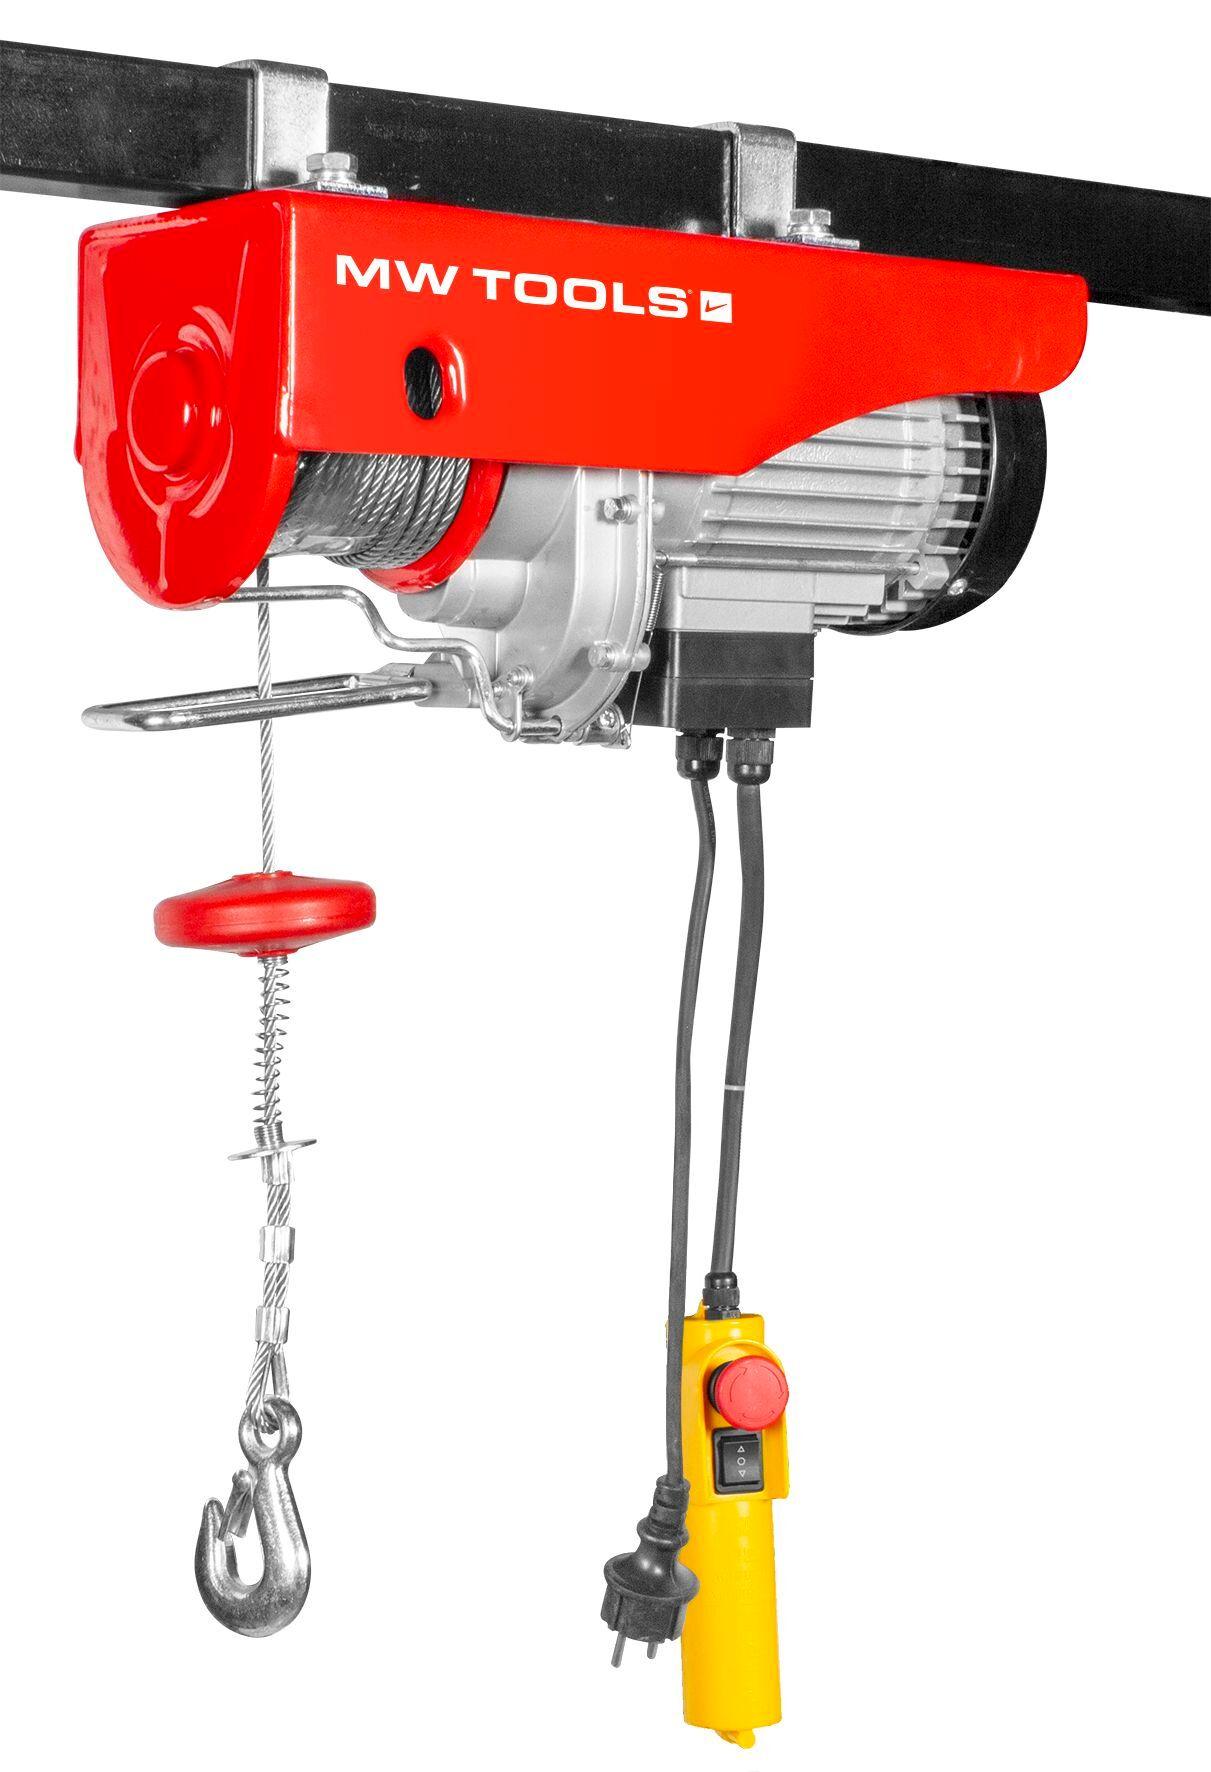 Mw-tools Palan électrique robuste 125/250 kg MW-Tools SH125/250